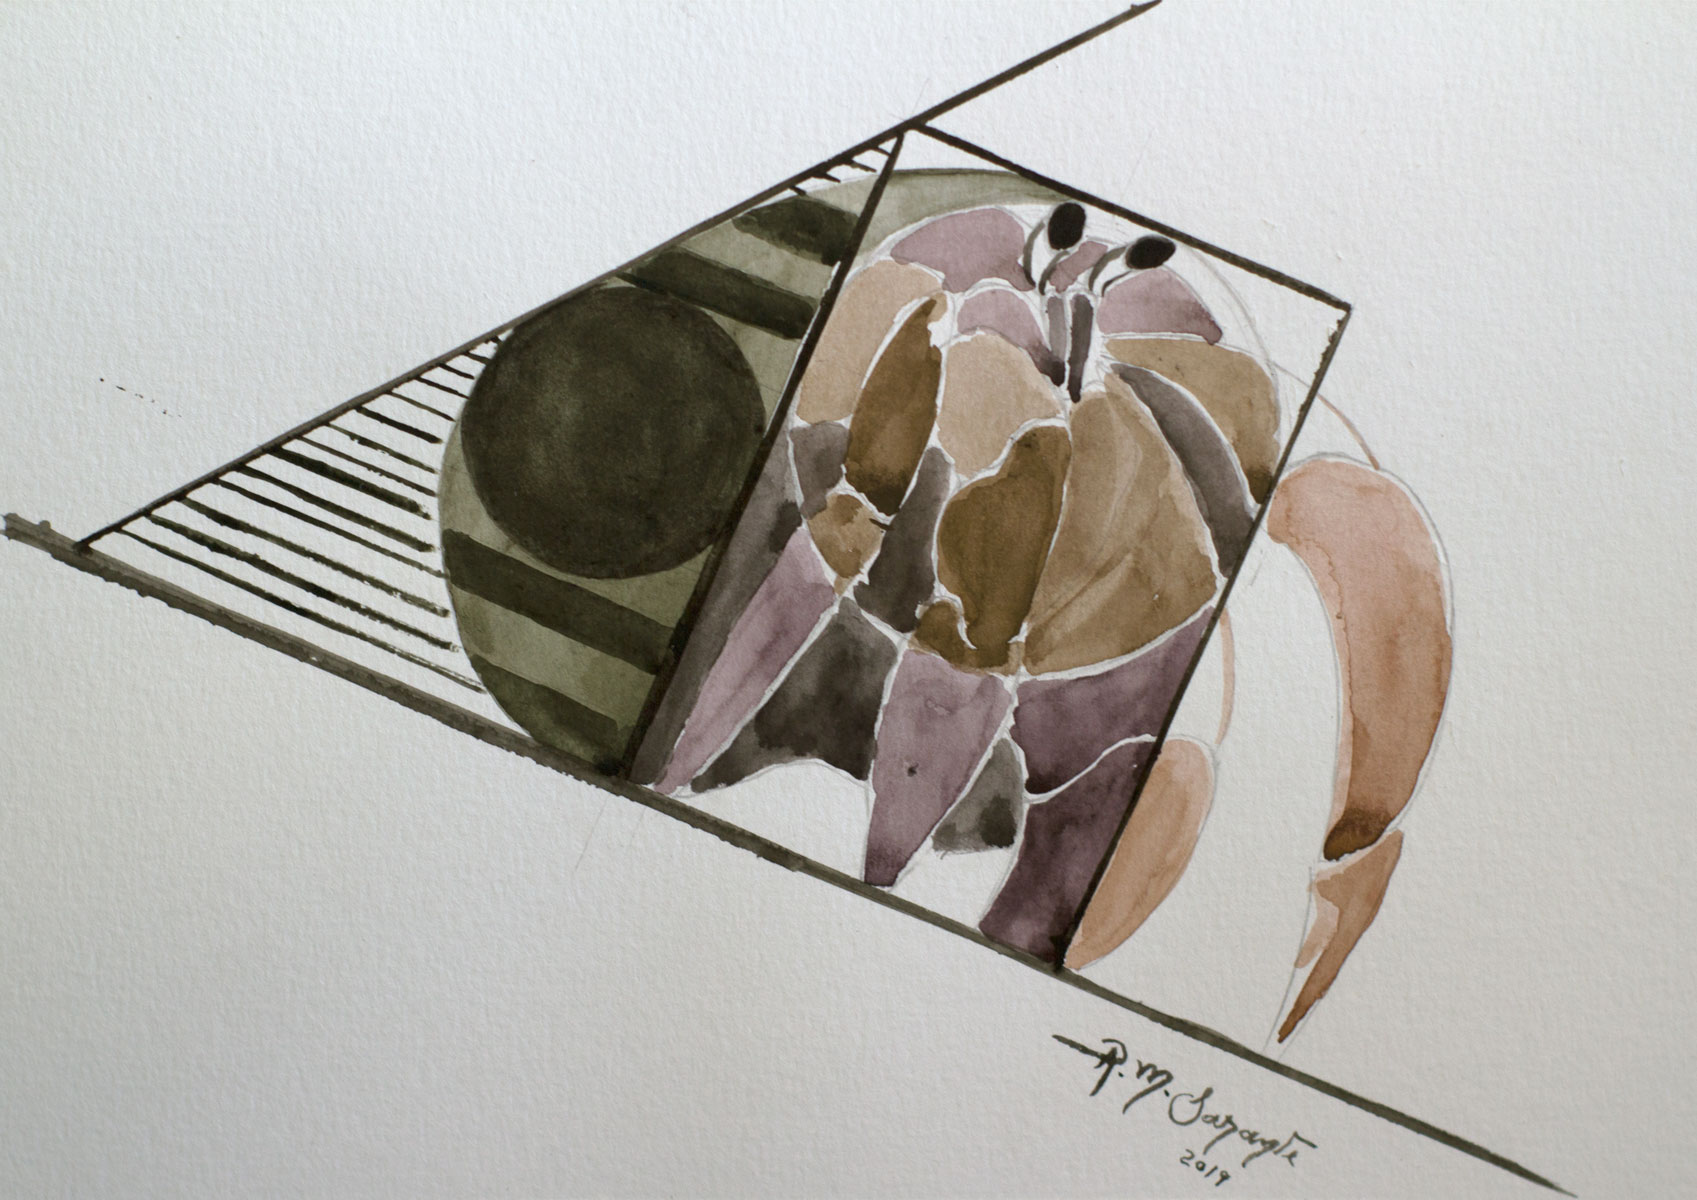 Crustacean no.3 using watercolor